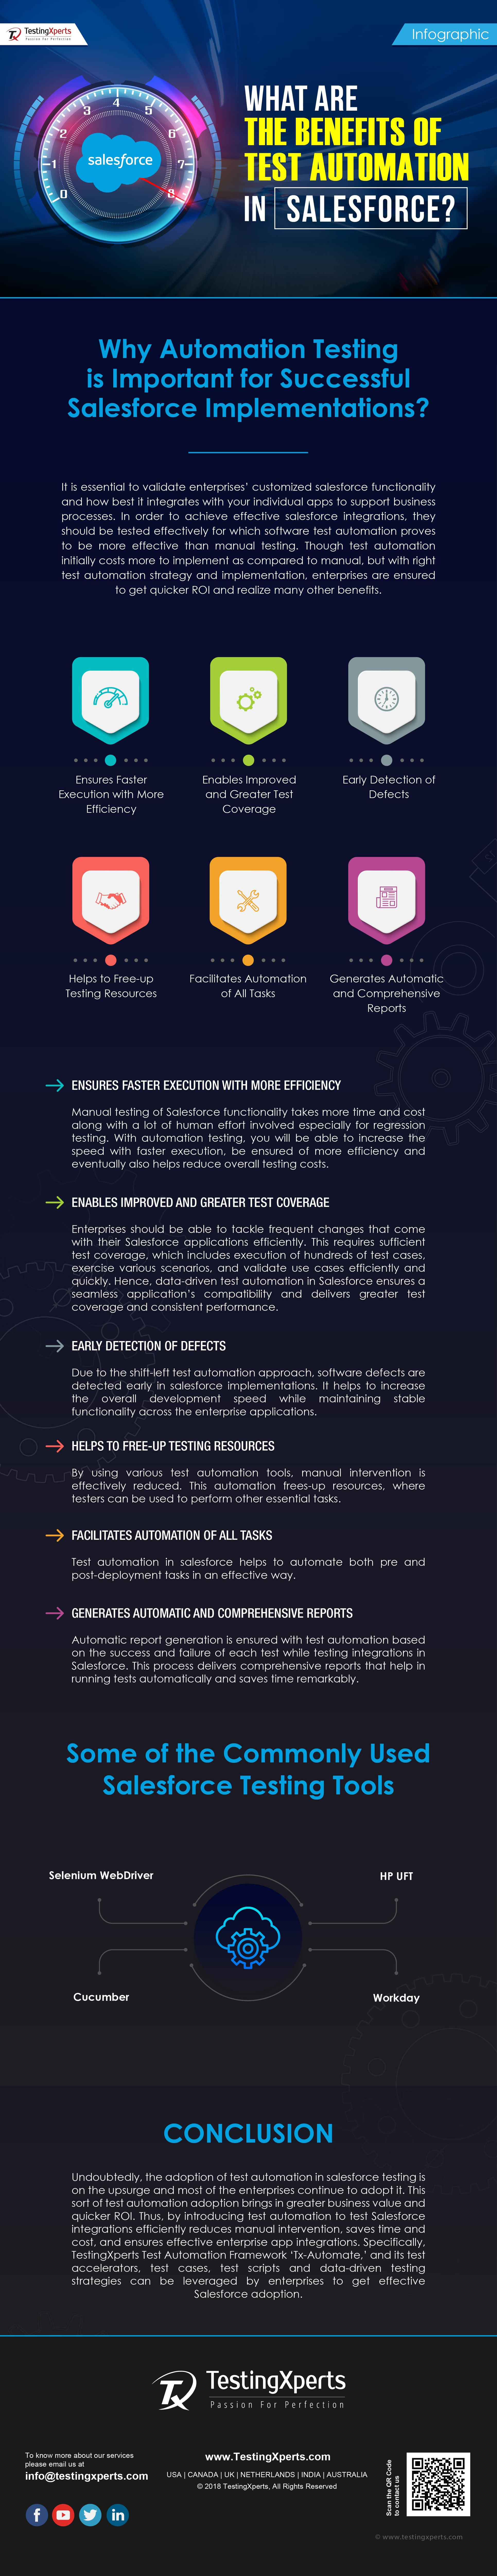 Test Automation SalesForce benefits